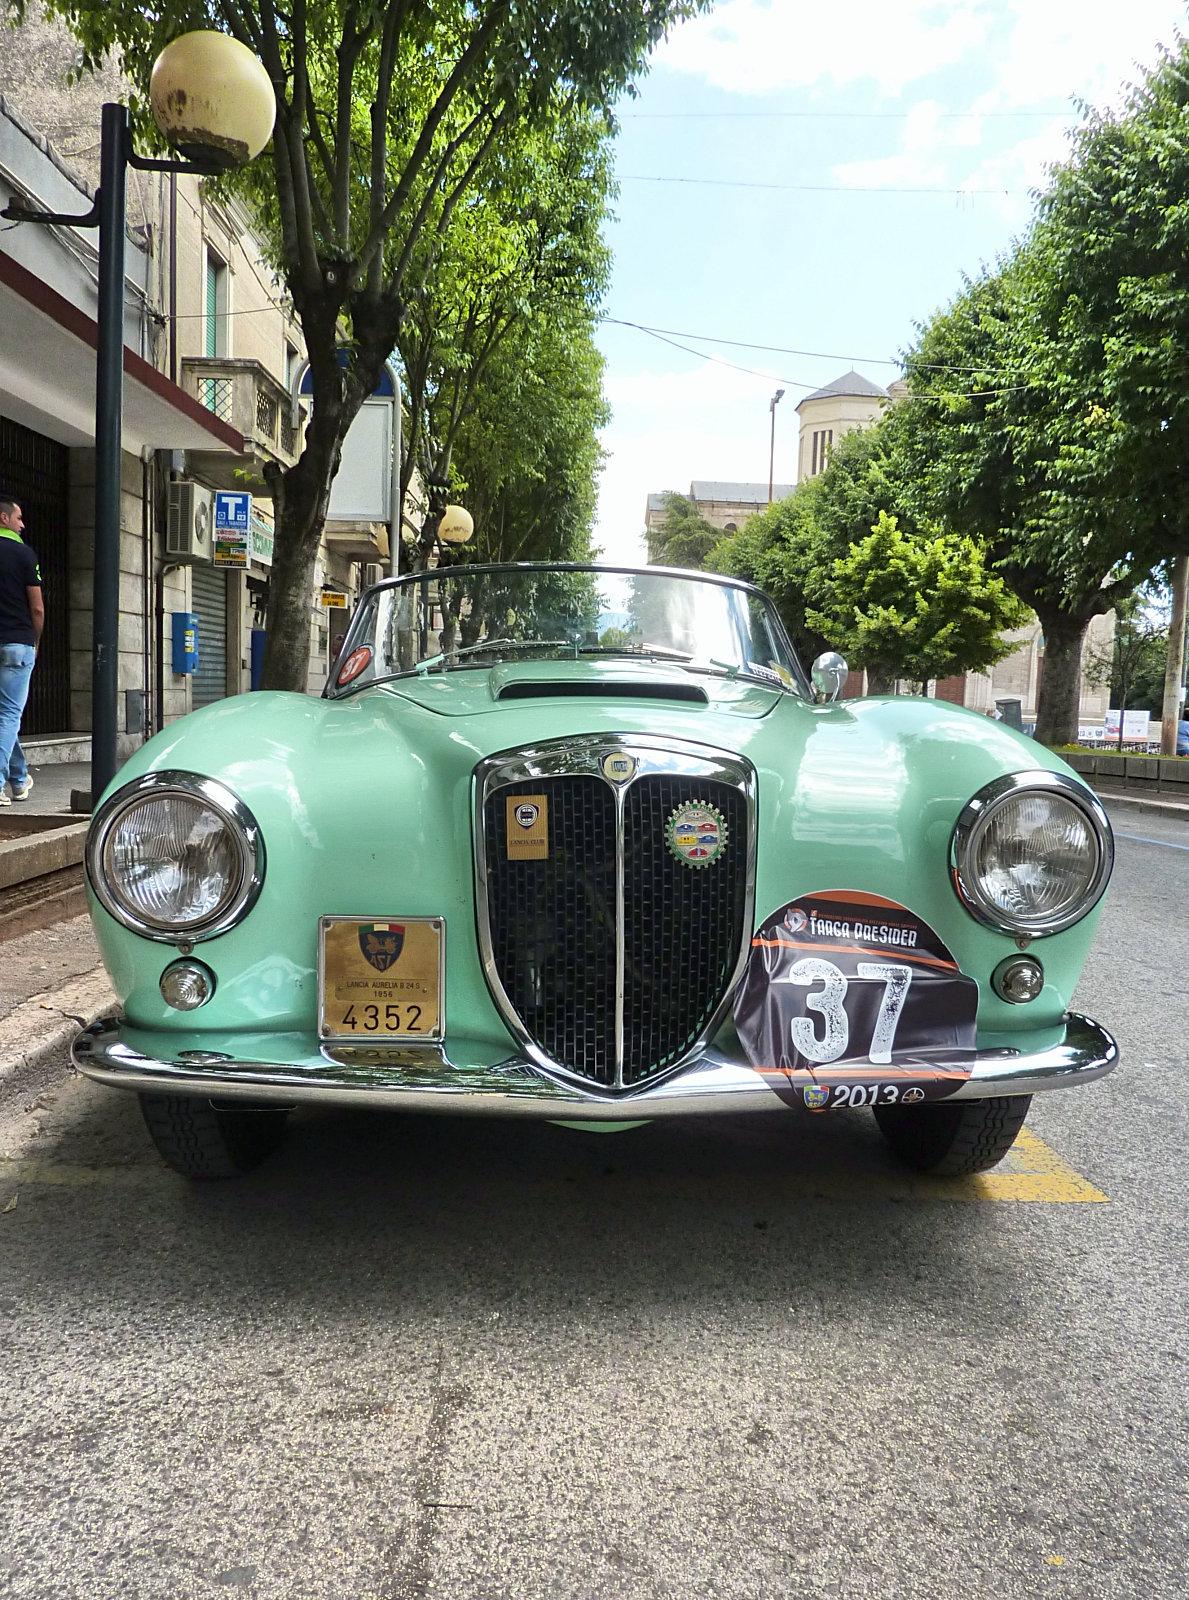 Lancia Aurelia B24 Spyder 110964 additionally Alfa romeo Giulia as well Young Girl Drives A Gumpert Apollo Around Monaco Like A Boss likewise 1970 Ferrari Dino 246 GT photo additionally Lancia Fulvia 1 2 Coupe 1967. on lancia spider